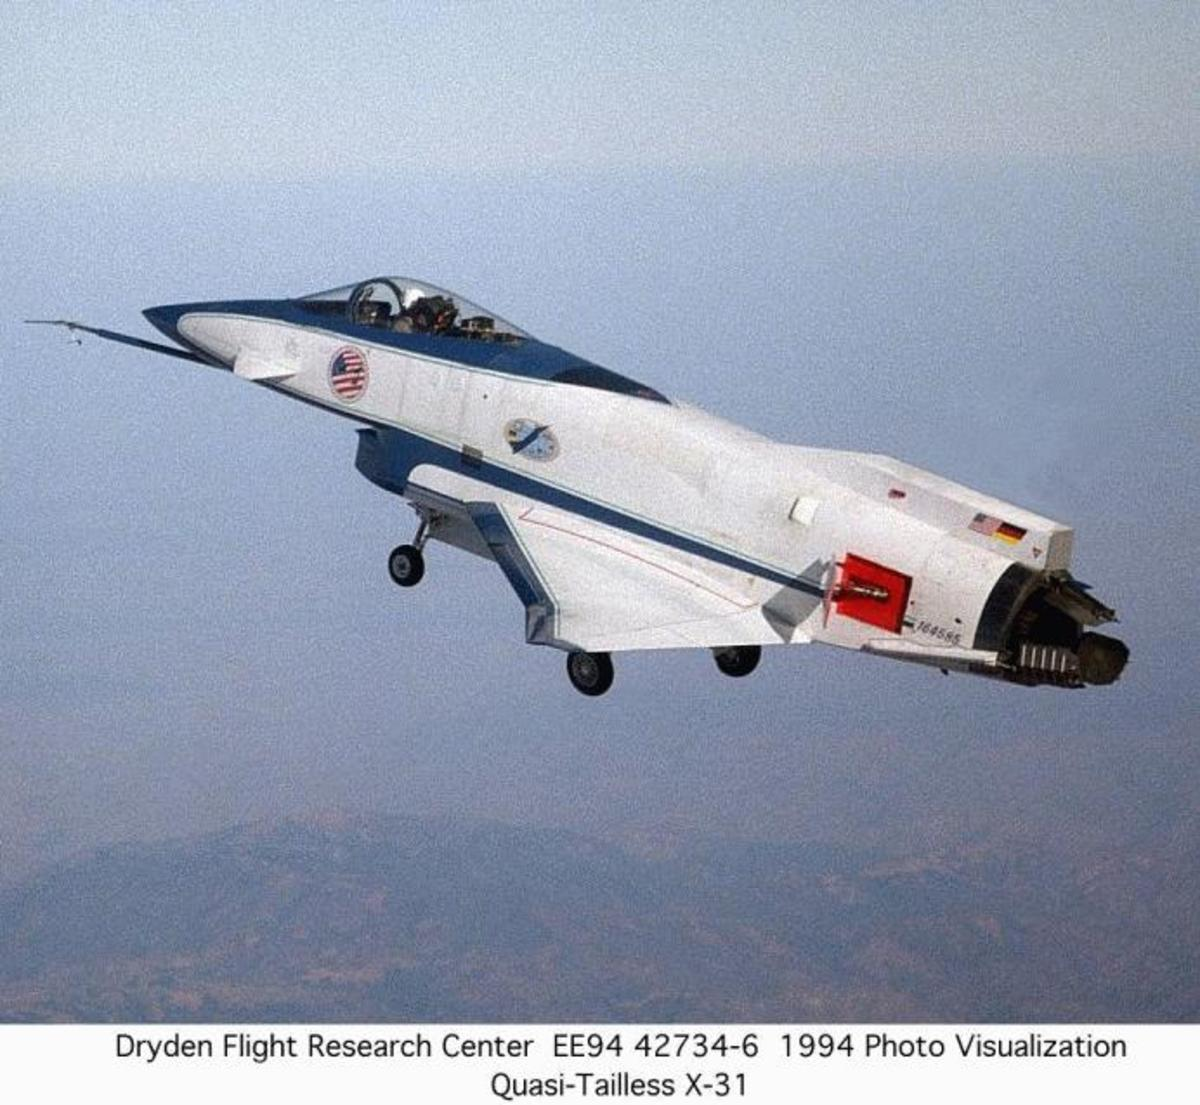 X-31 aircraft mid air.